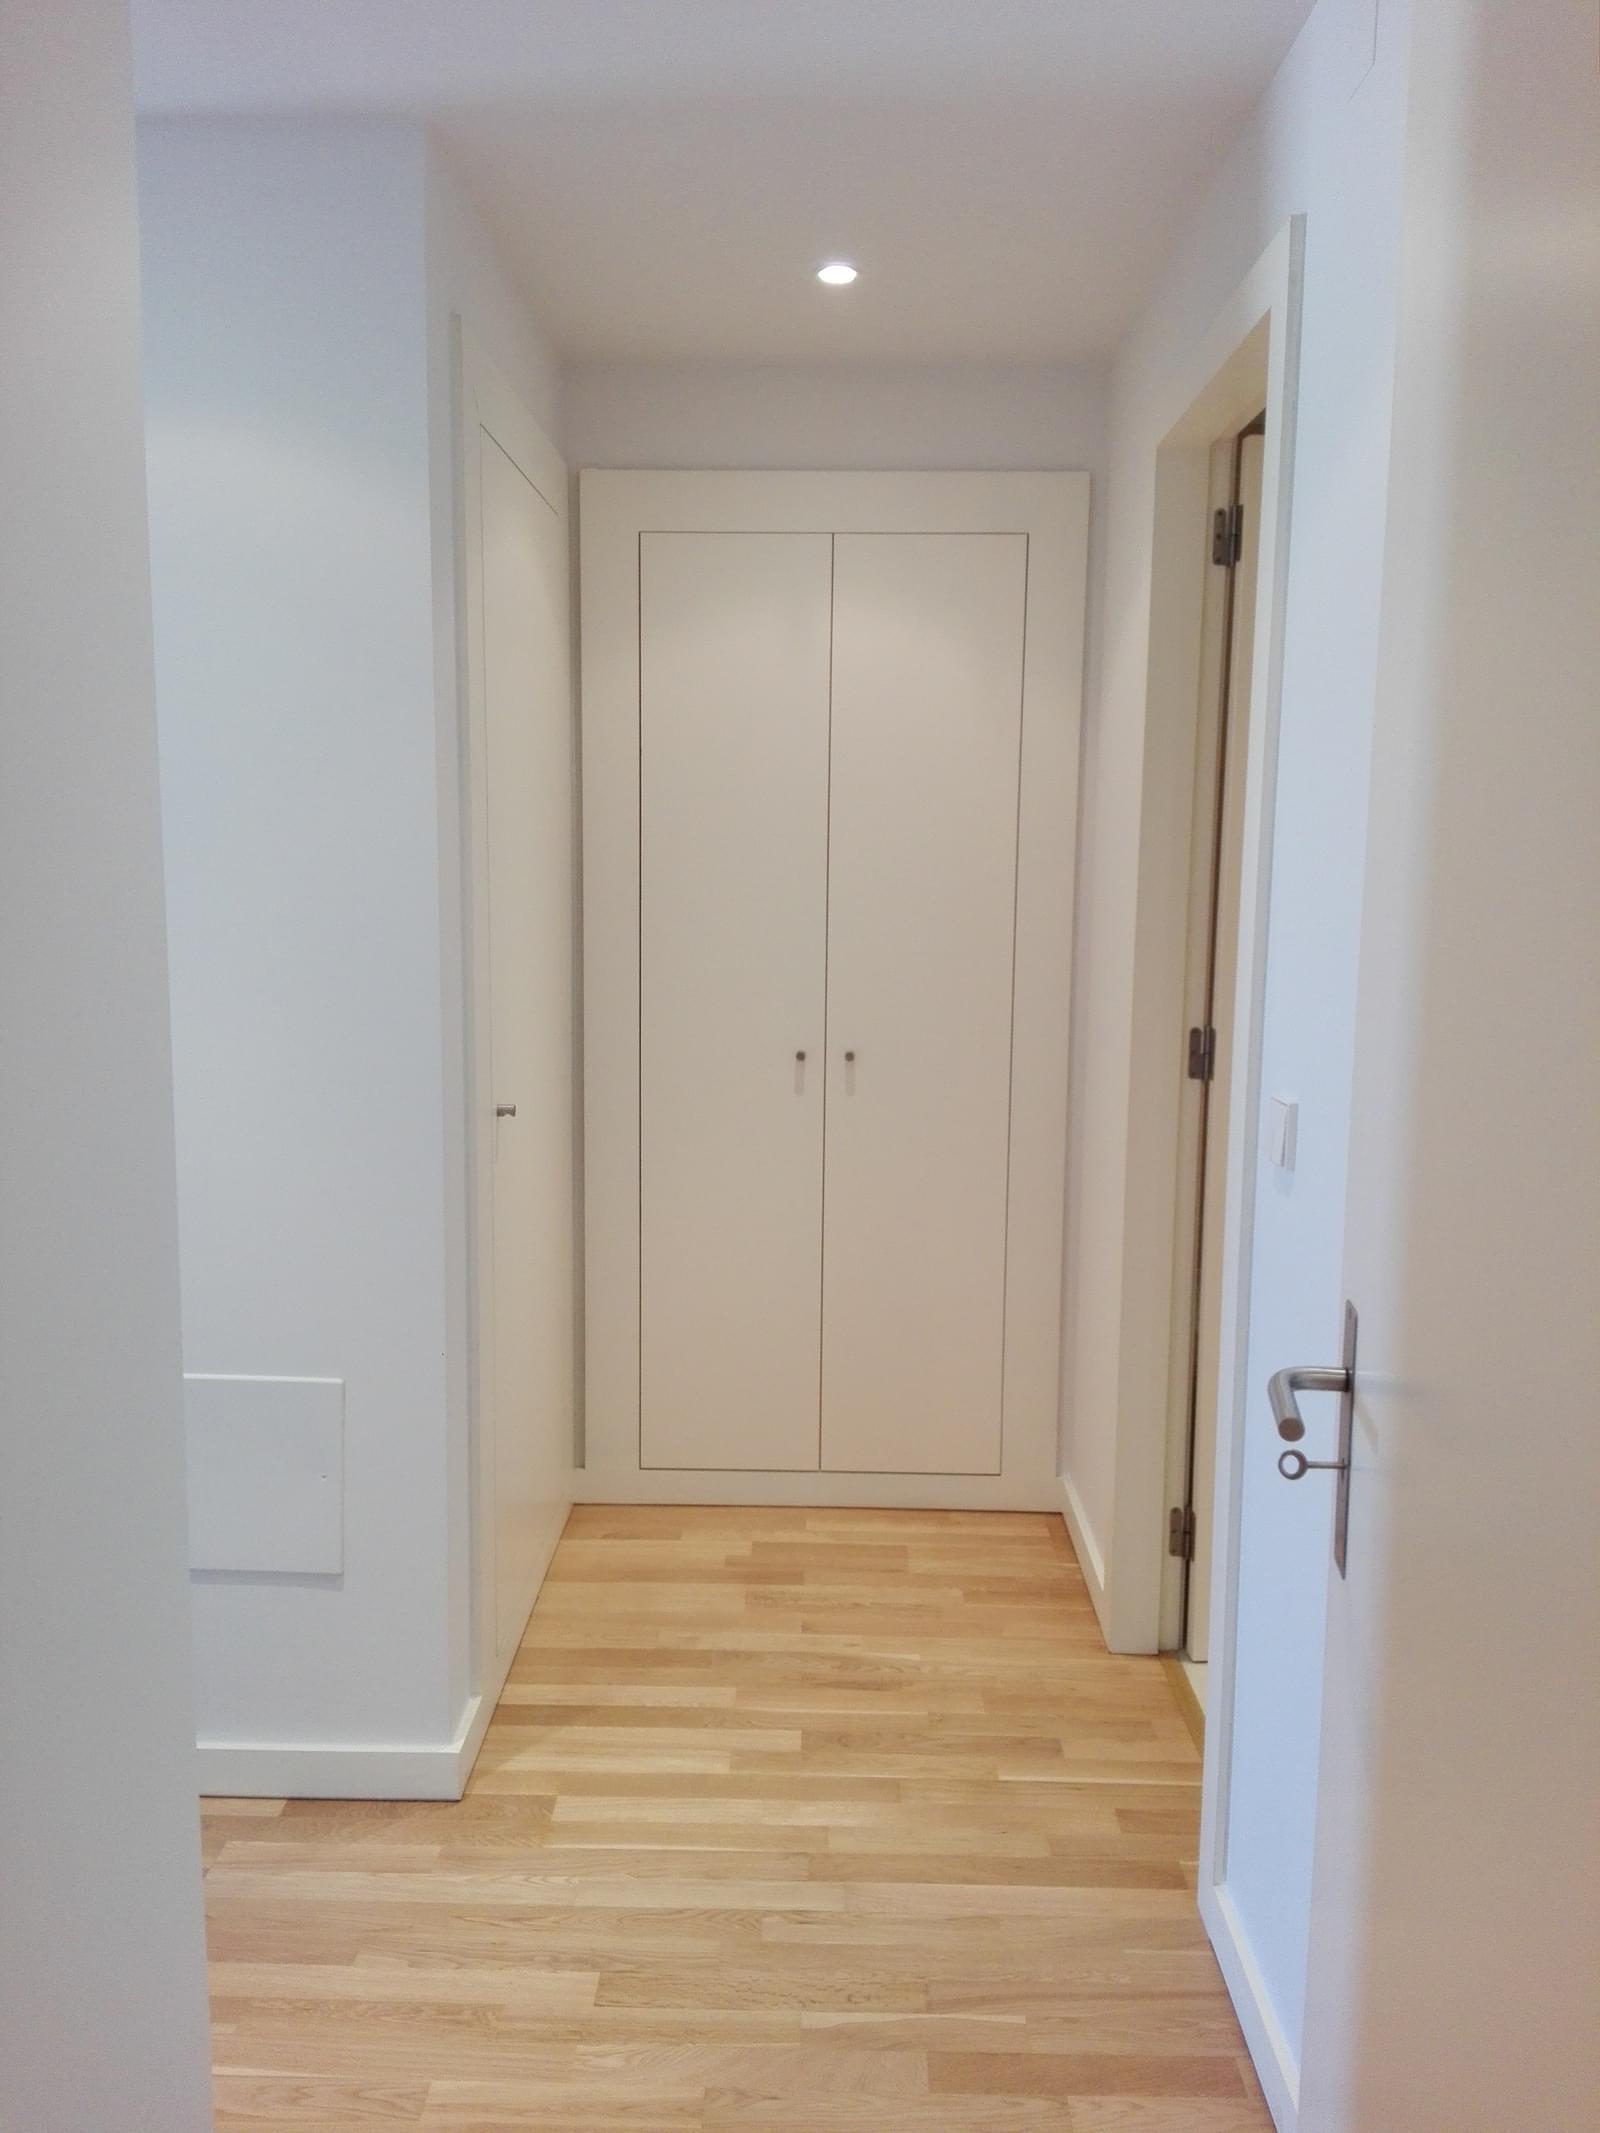 pf18814-apartamento-t2-lisboa-6a223f56-0f4d-40bb-a5af-3b82959abba1